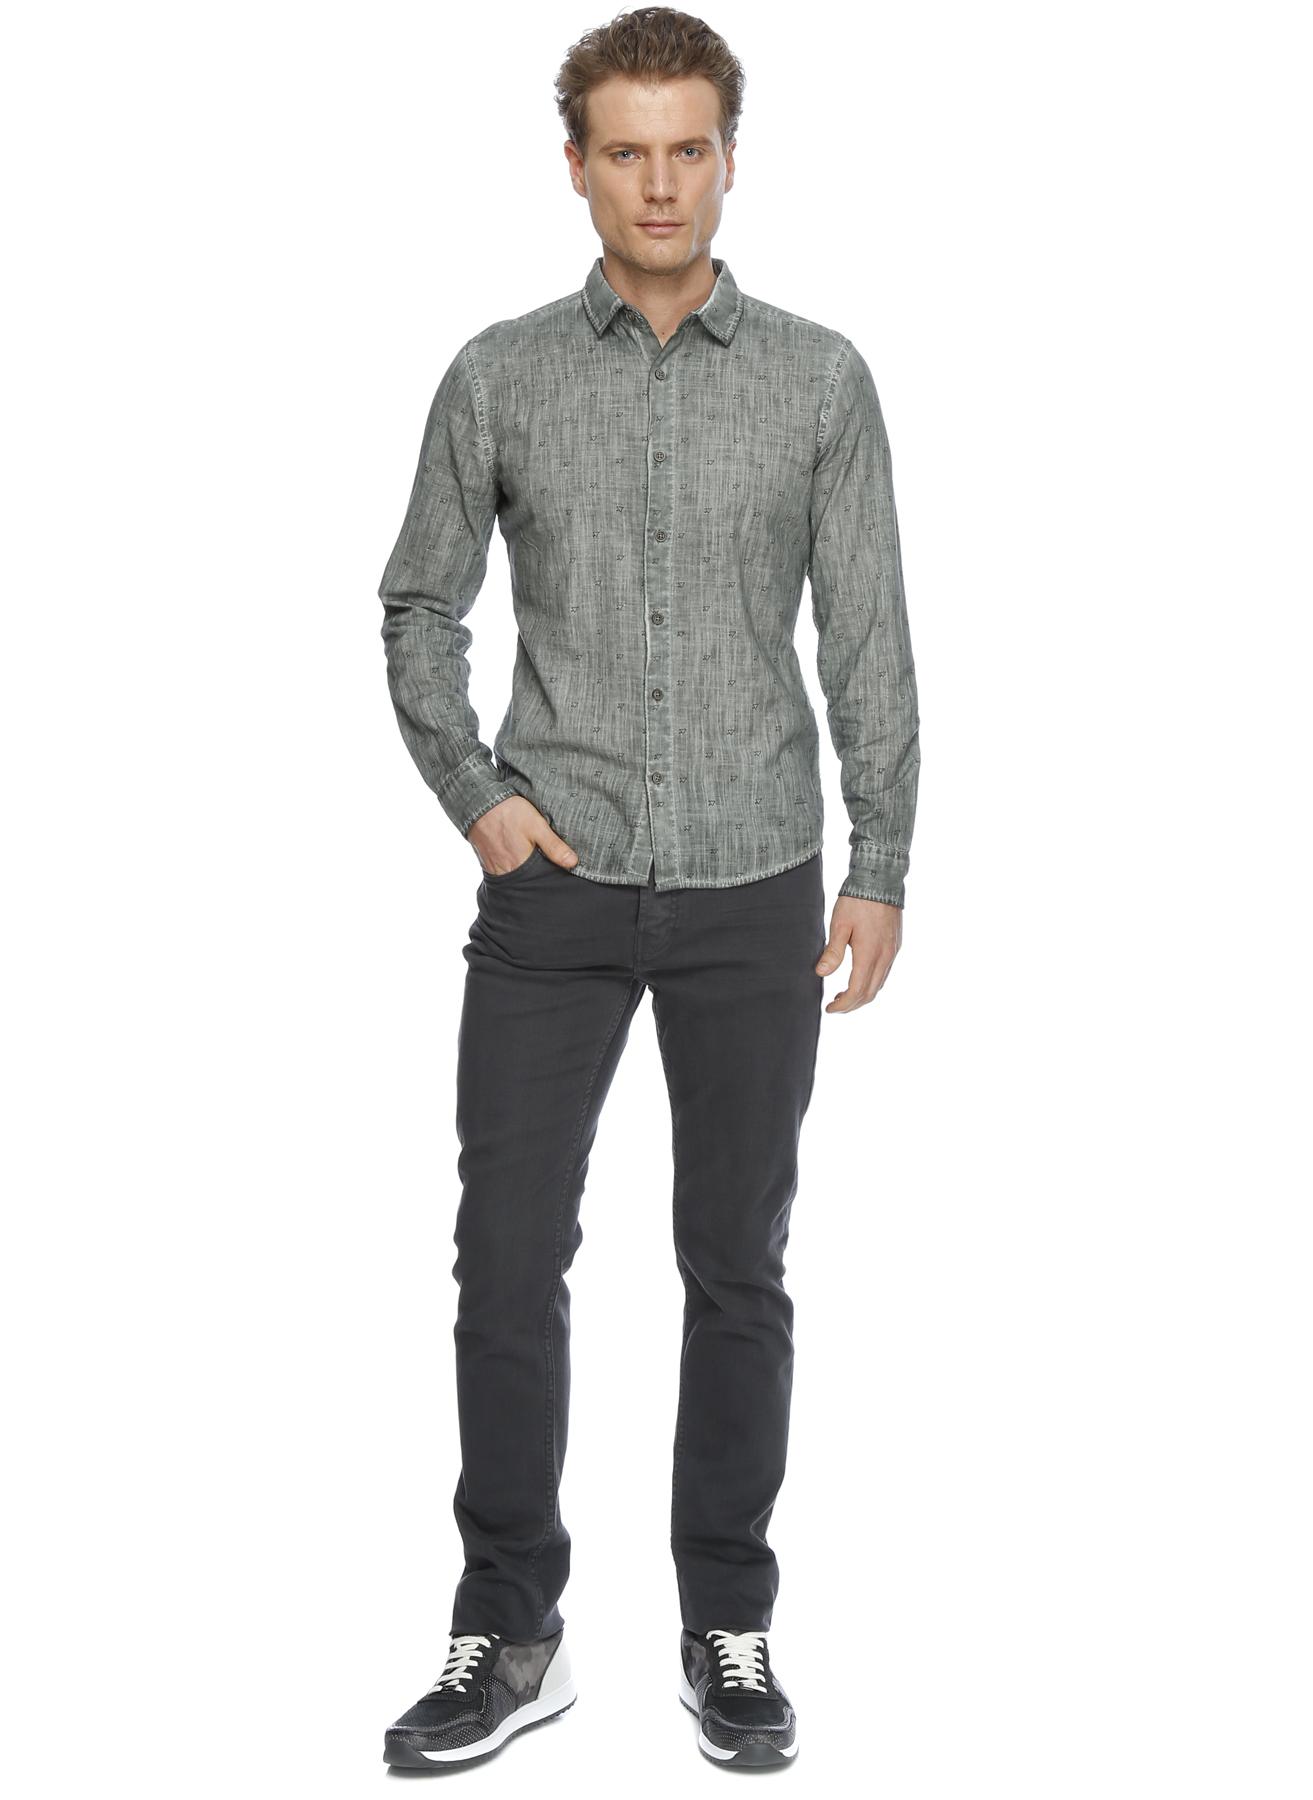 Loft Outstanding Stil Klasik Pantolon 30-30 5000194820003 Ürün Resmi